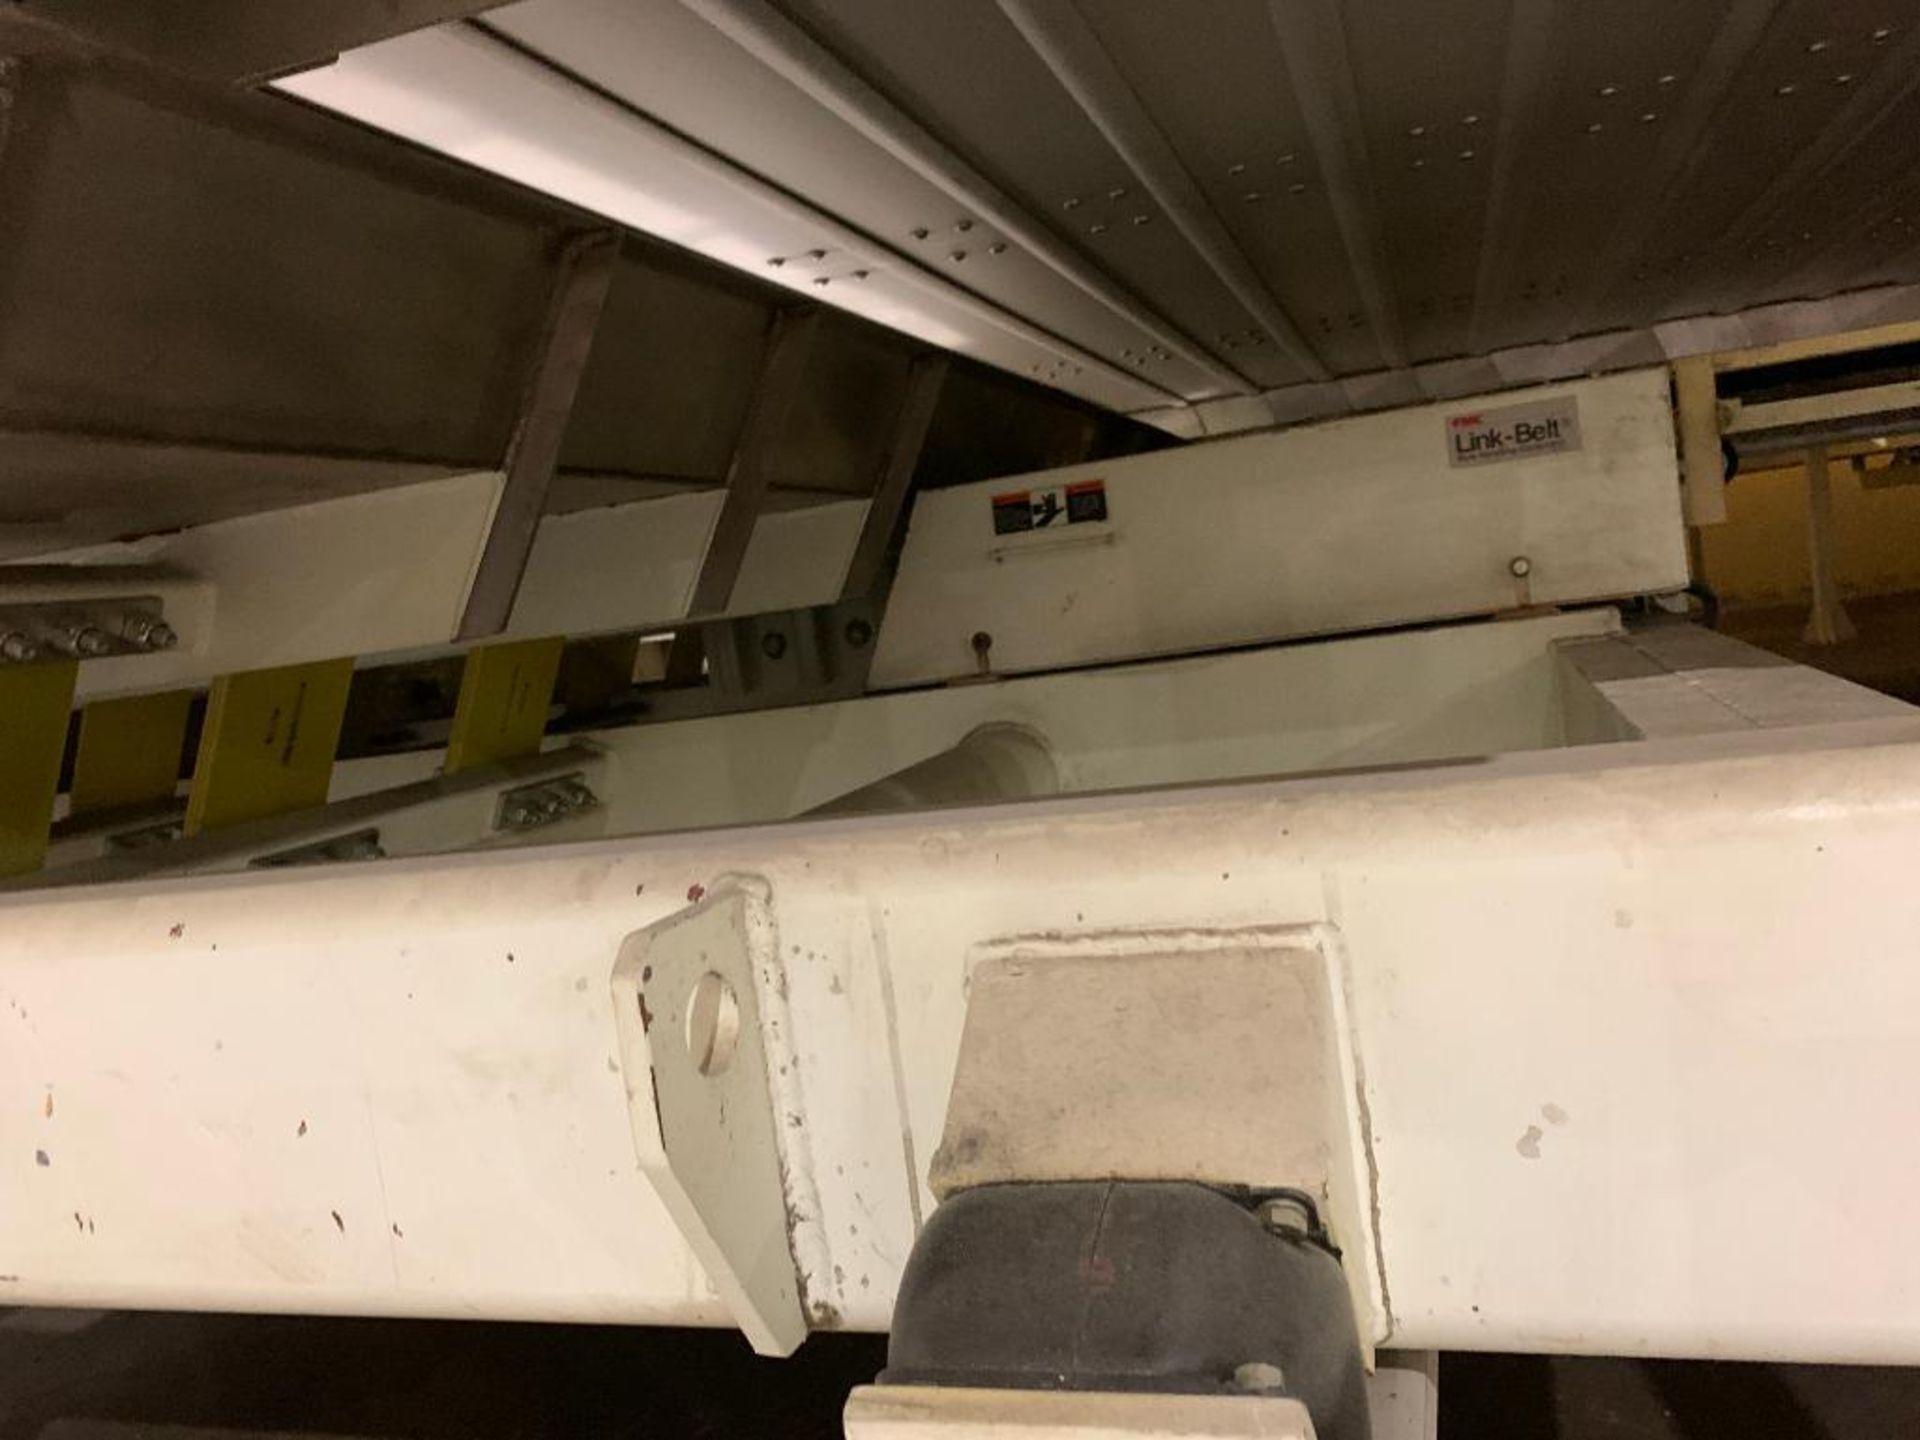 Link-Belt vibratory conveyor - Image 8 of 13